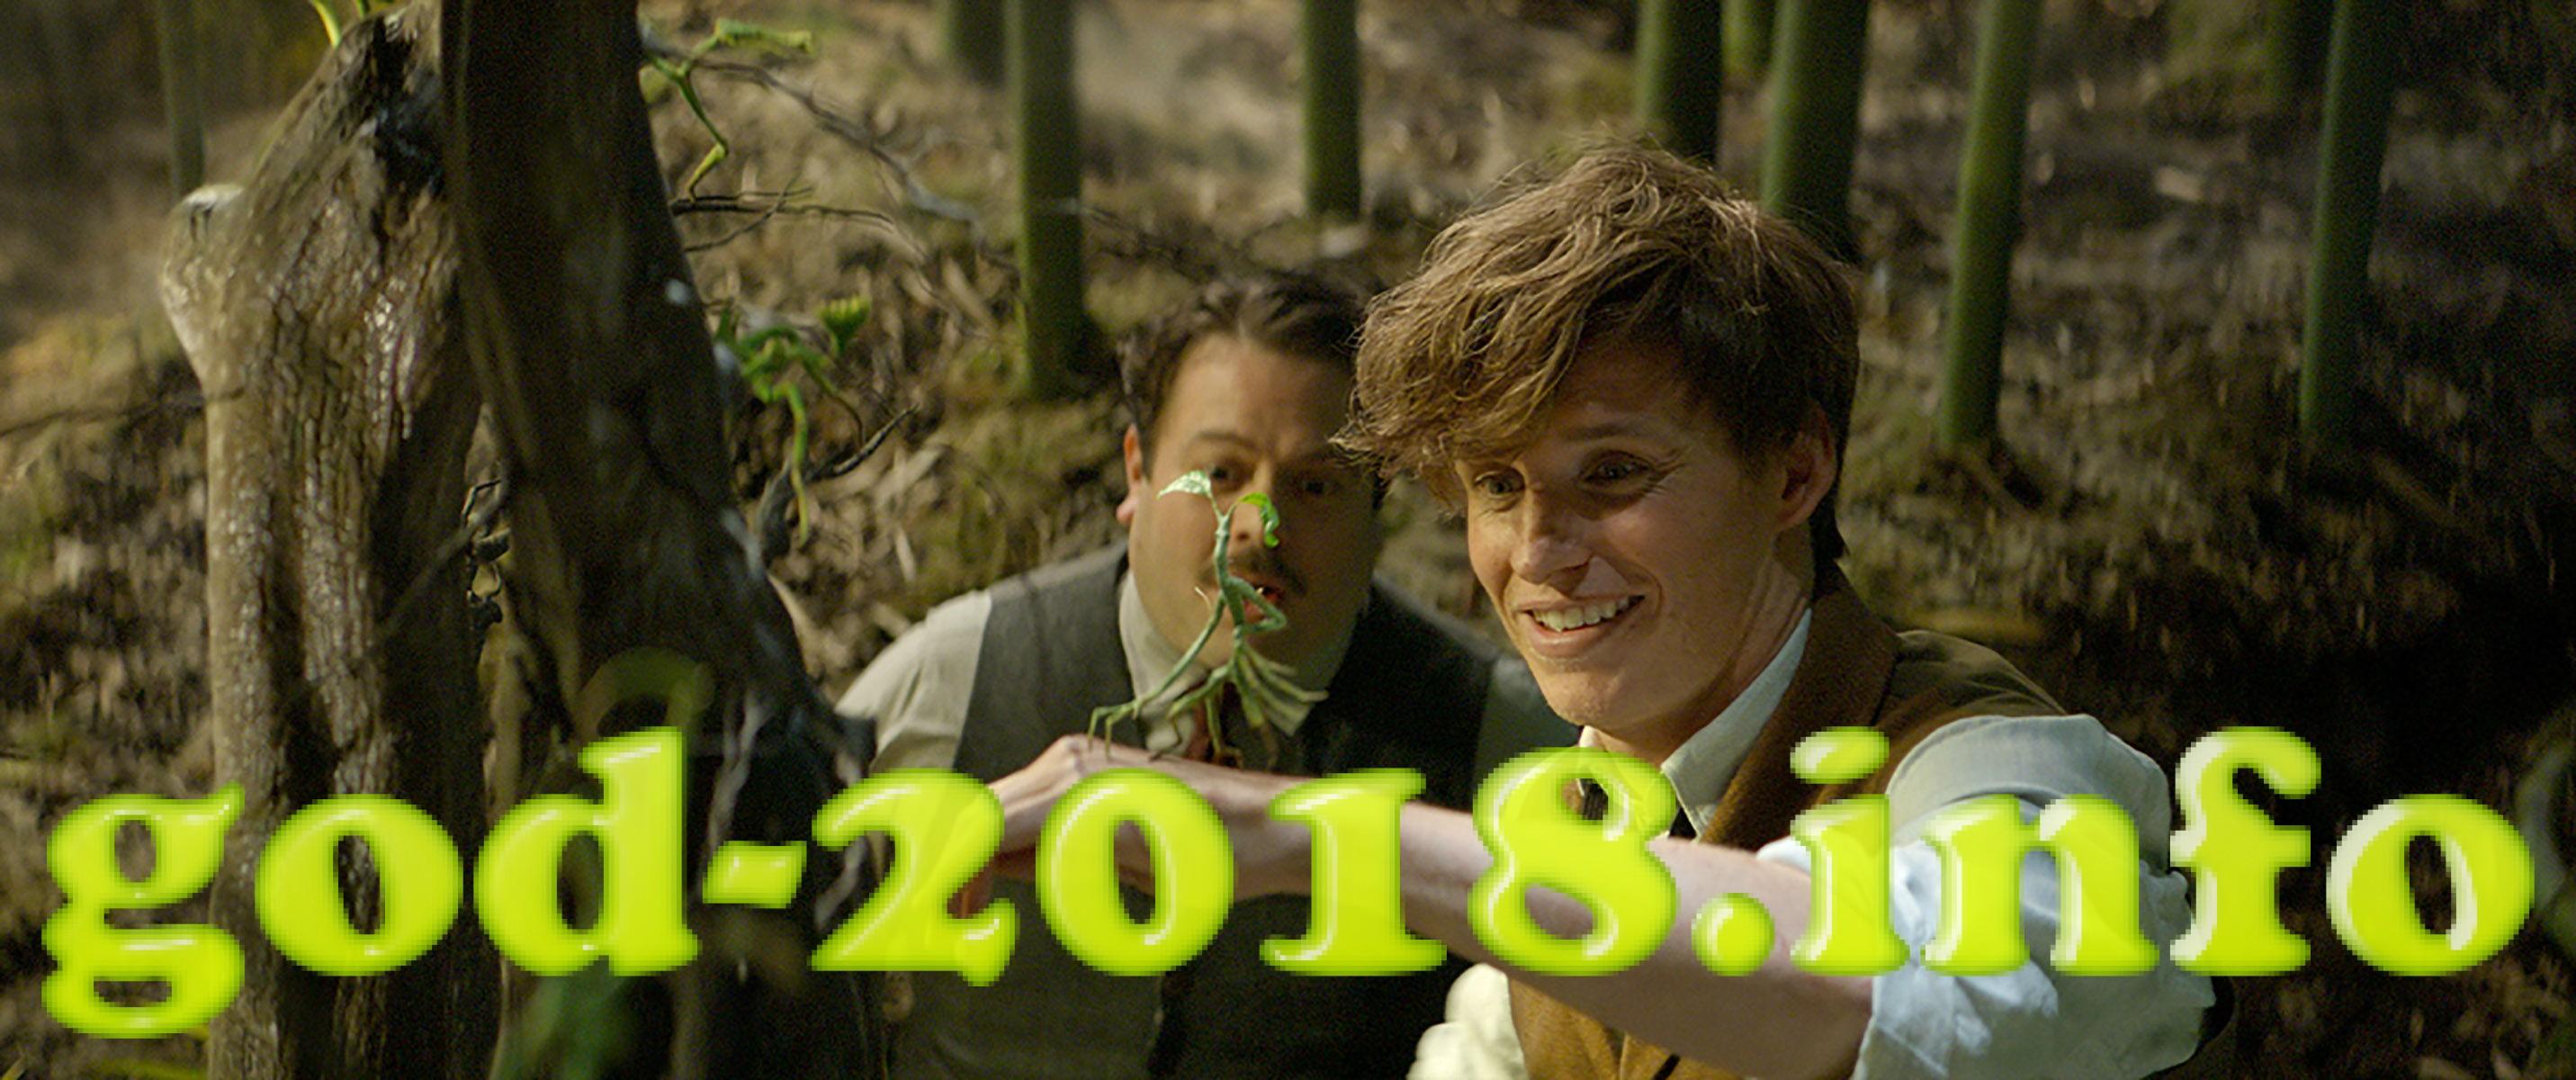 fantasticheskie-tvari-i-gde-oni-obitajut-chast-2-v-2018-godu-4